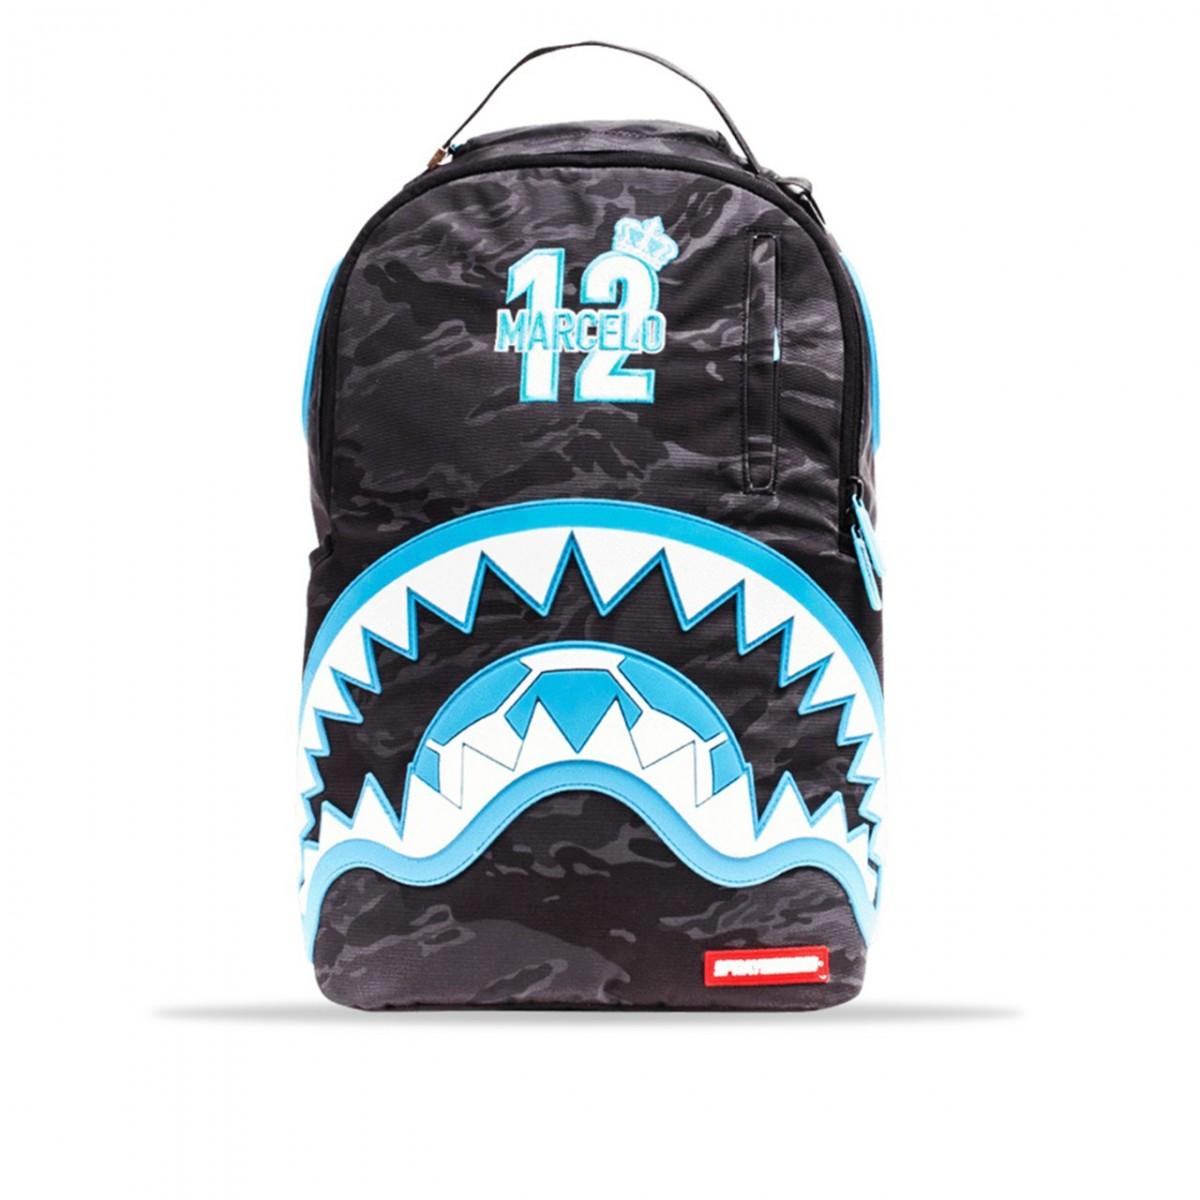 Shark Marcelo Sprayground 910b1871nsz Rubber Blue Backpack Grey dtqBSq8n